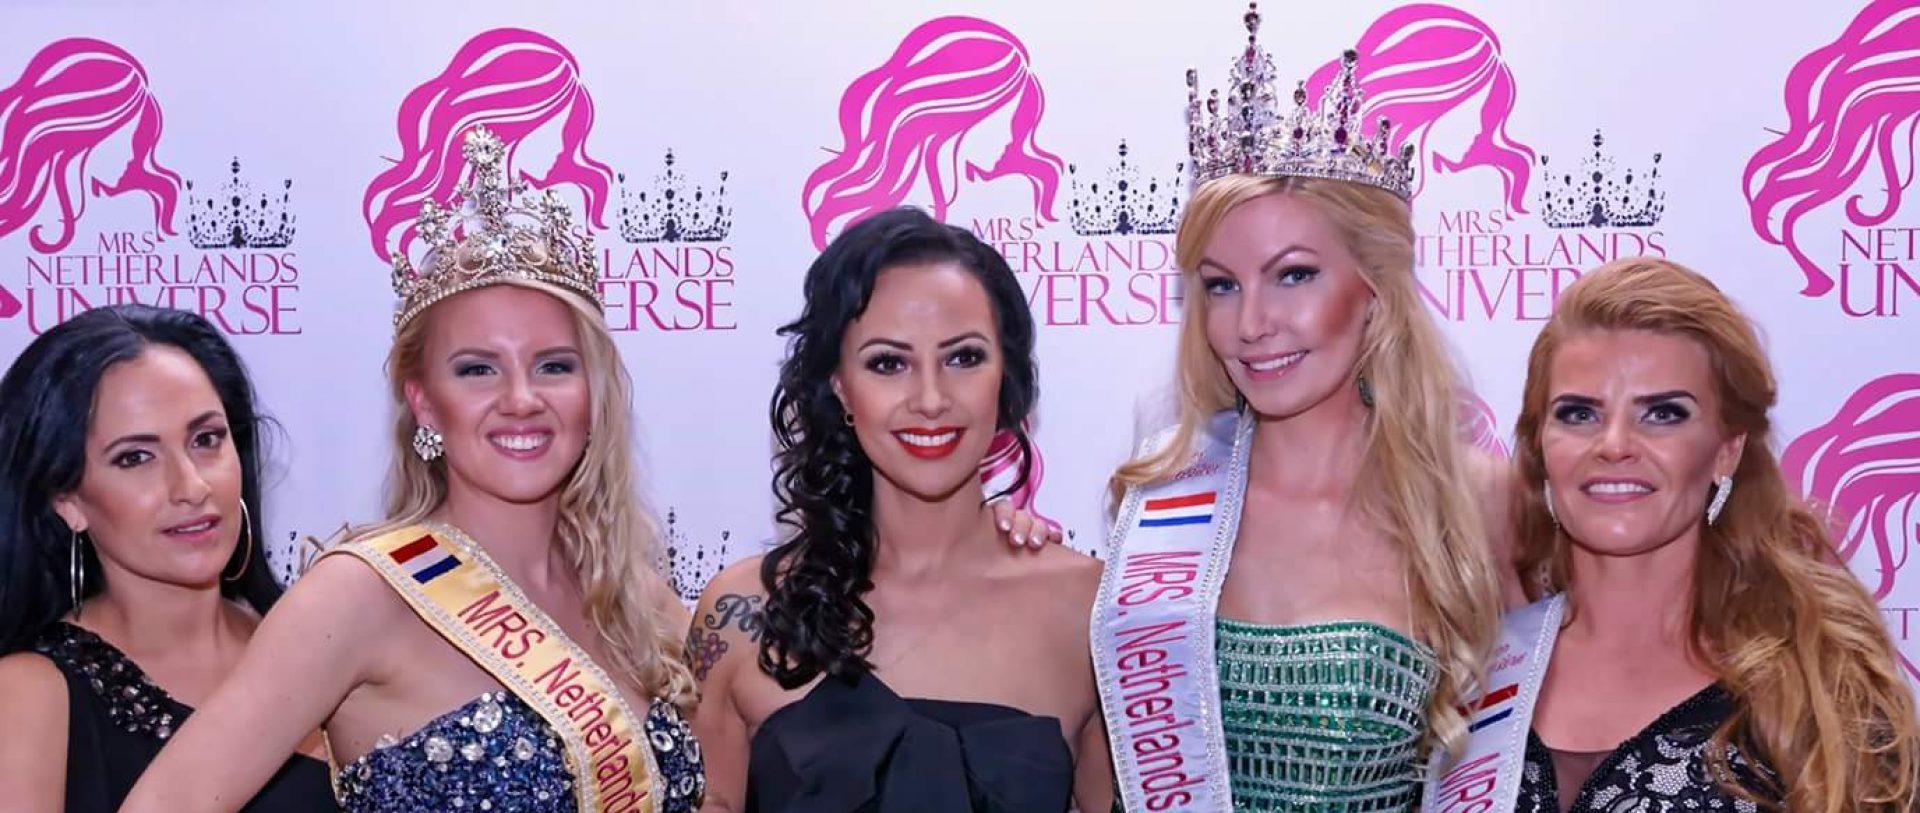 Mrs. Netherlands Universe